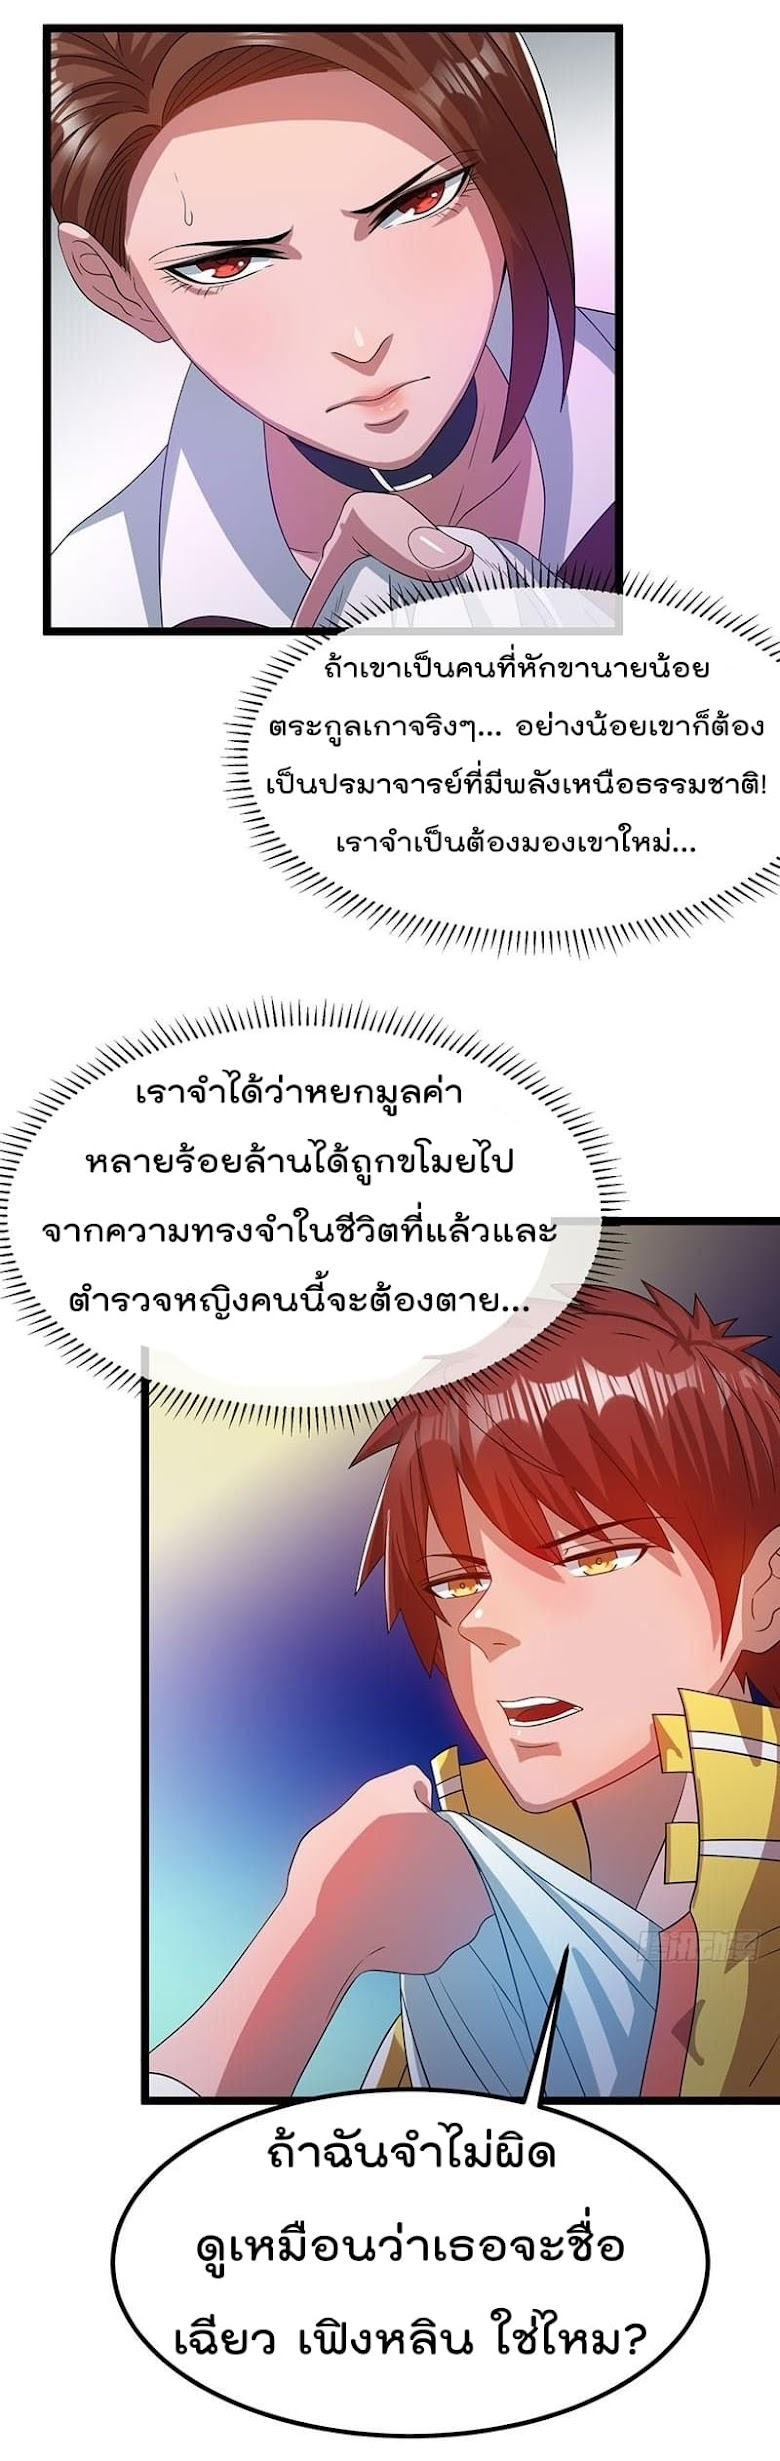 Immortal King of City - หน้า 13